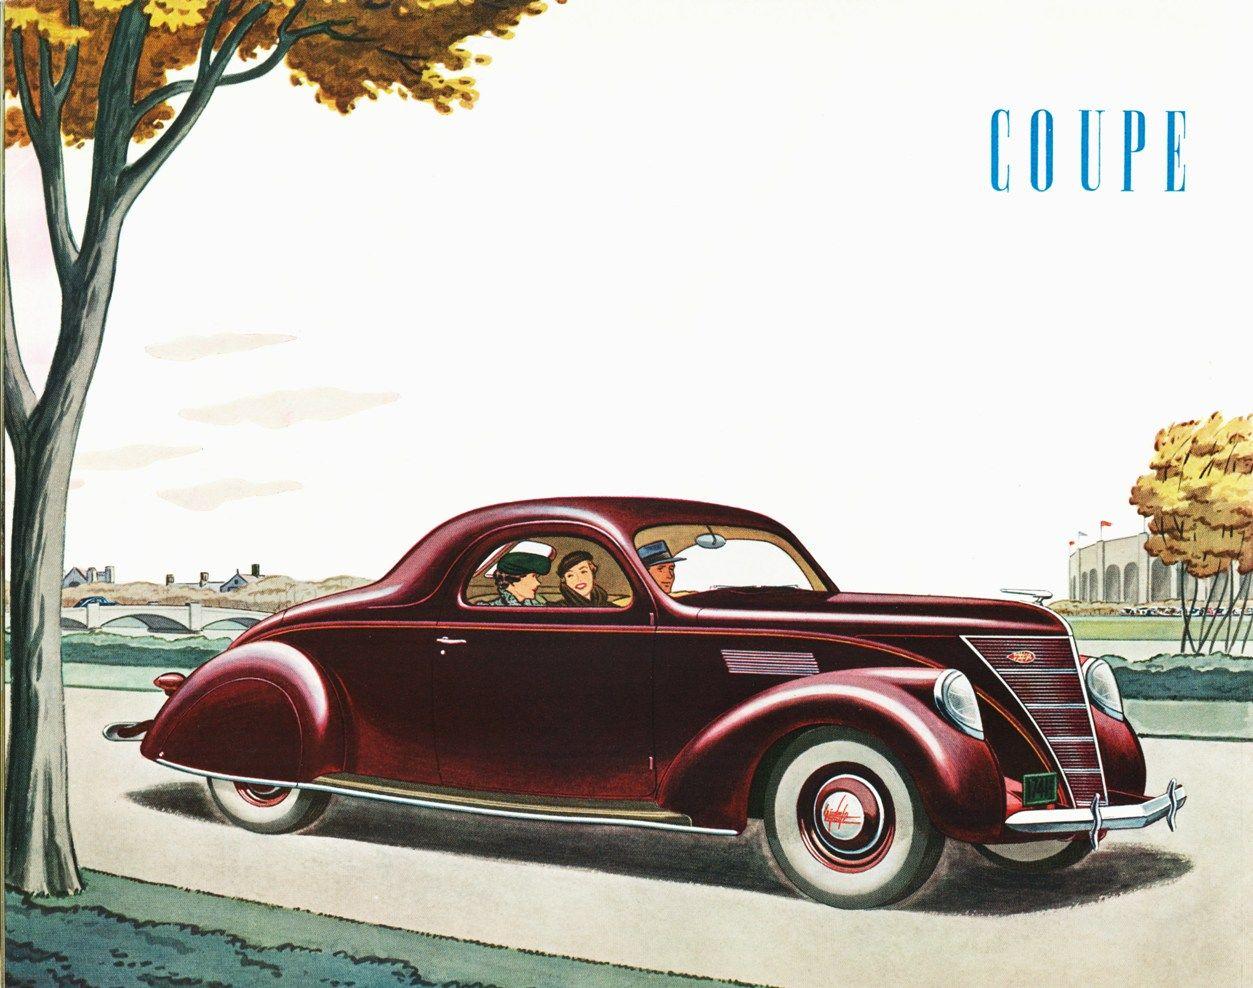 1936 Lincoln Zephyr Milestones Lincoln Zephyr Lincoln Cars